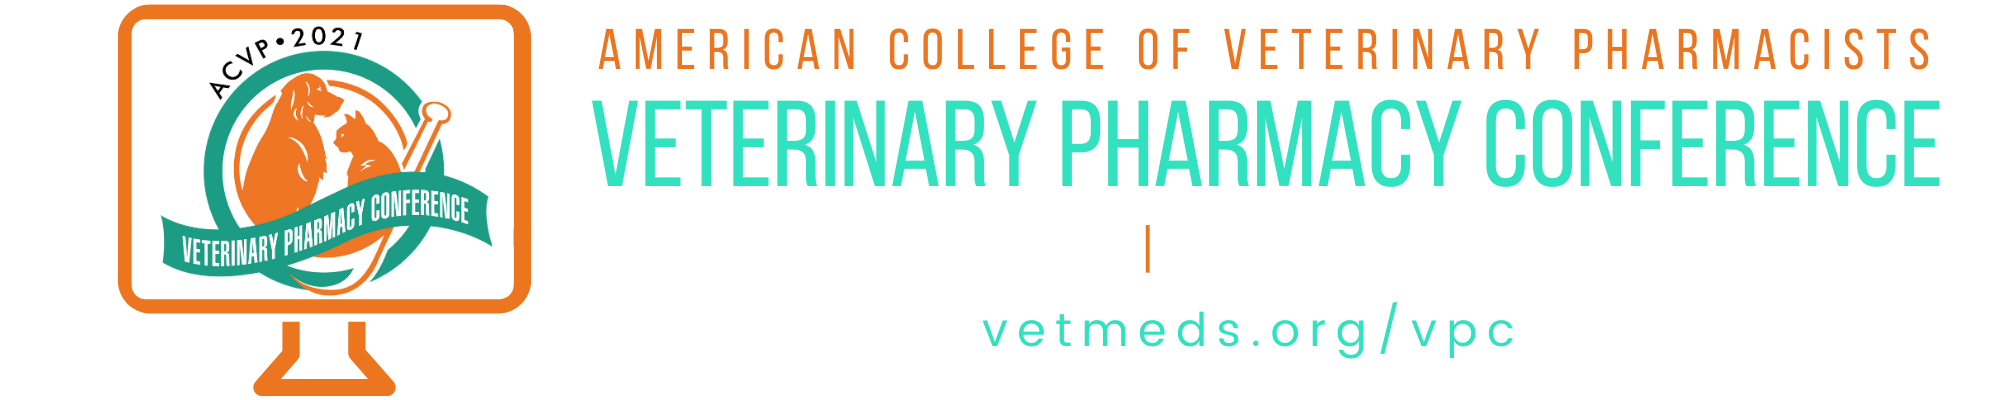 VPC 2021 Banner Ad Transparent